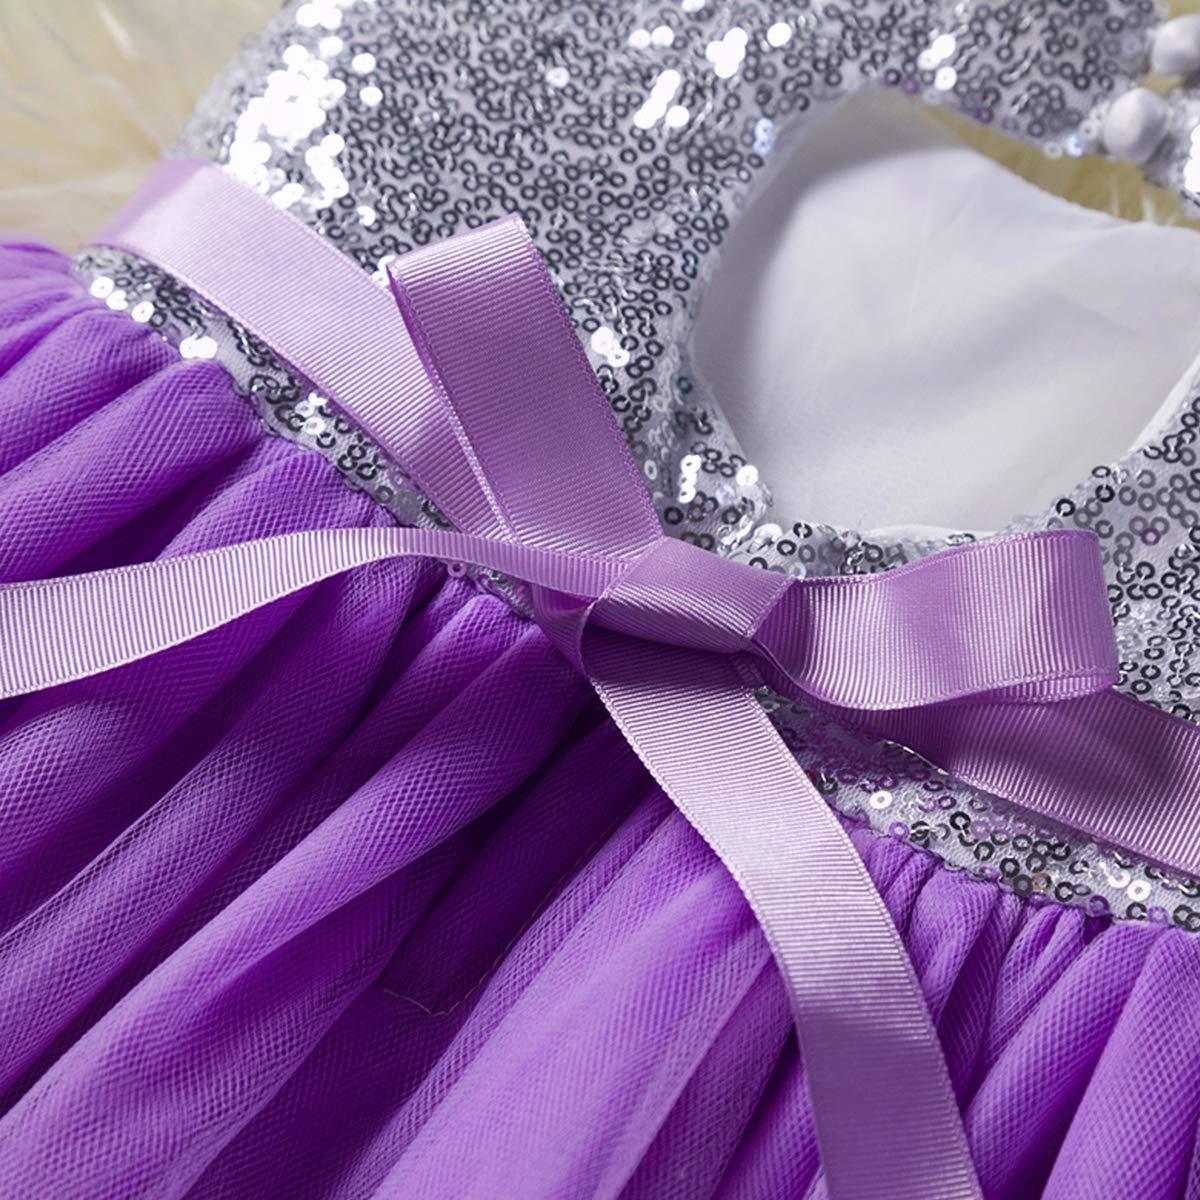 Toddler Kid Girls Dress|Sleeveless Floral Sequins Lace Tutu Dress for Party Wedding Princess